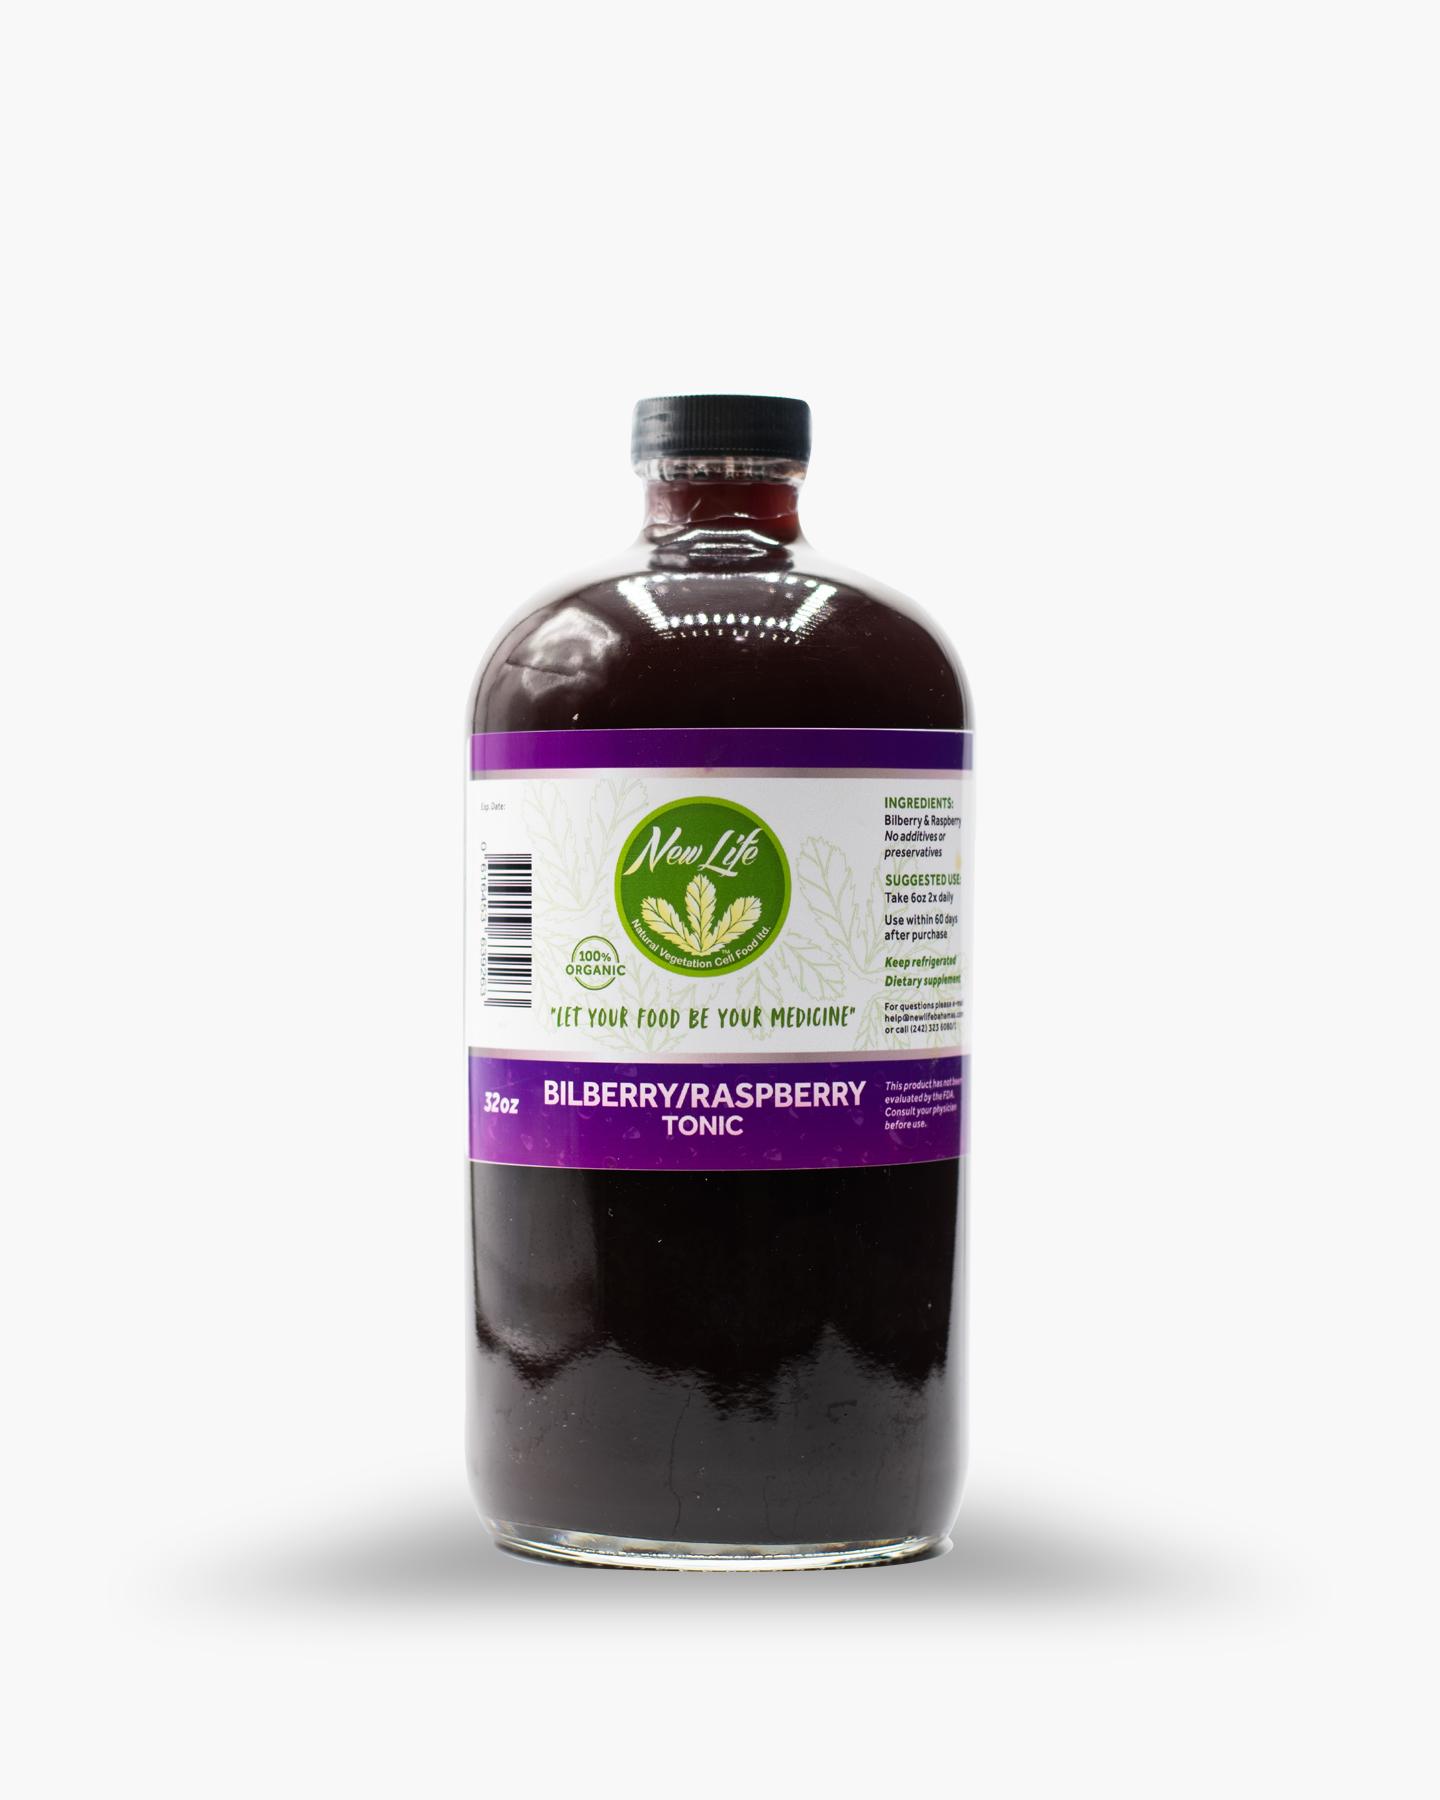 Bilberry Raspberry Tonic